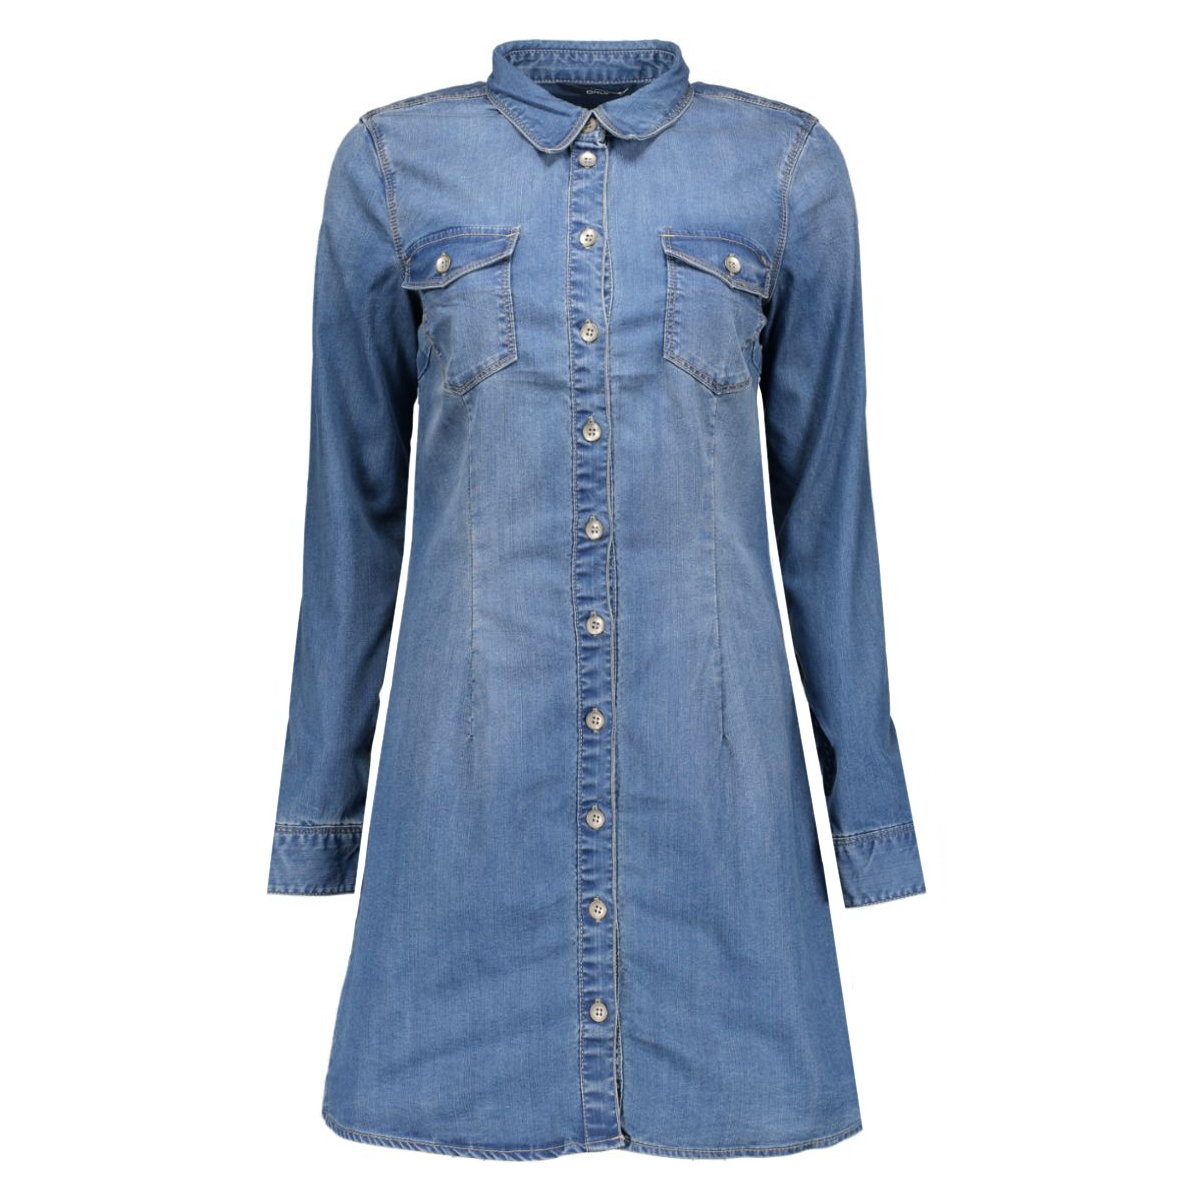 onllonni denim shirt dress qyt 15126844 only jurk medium blue denim